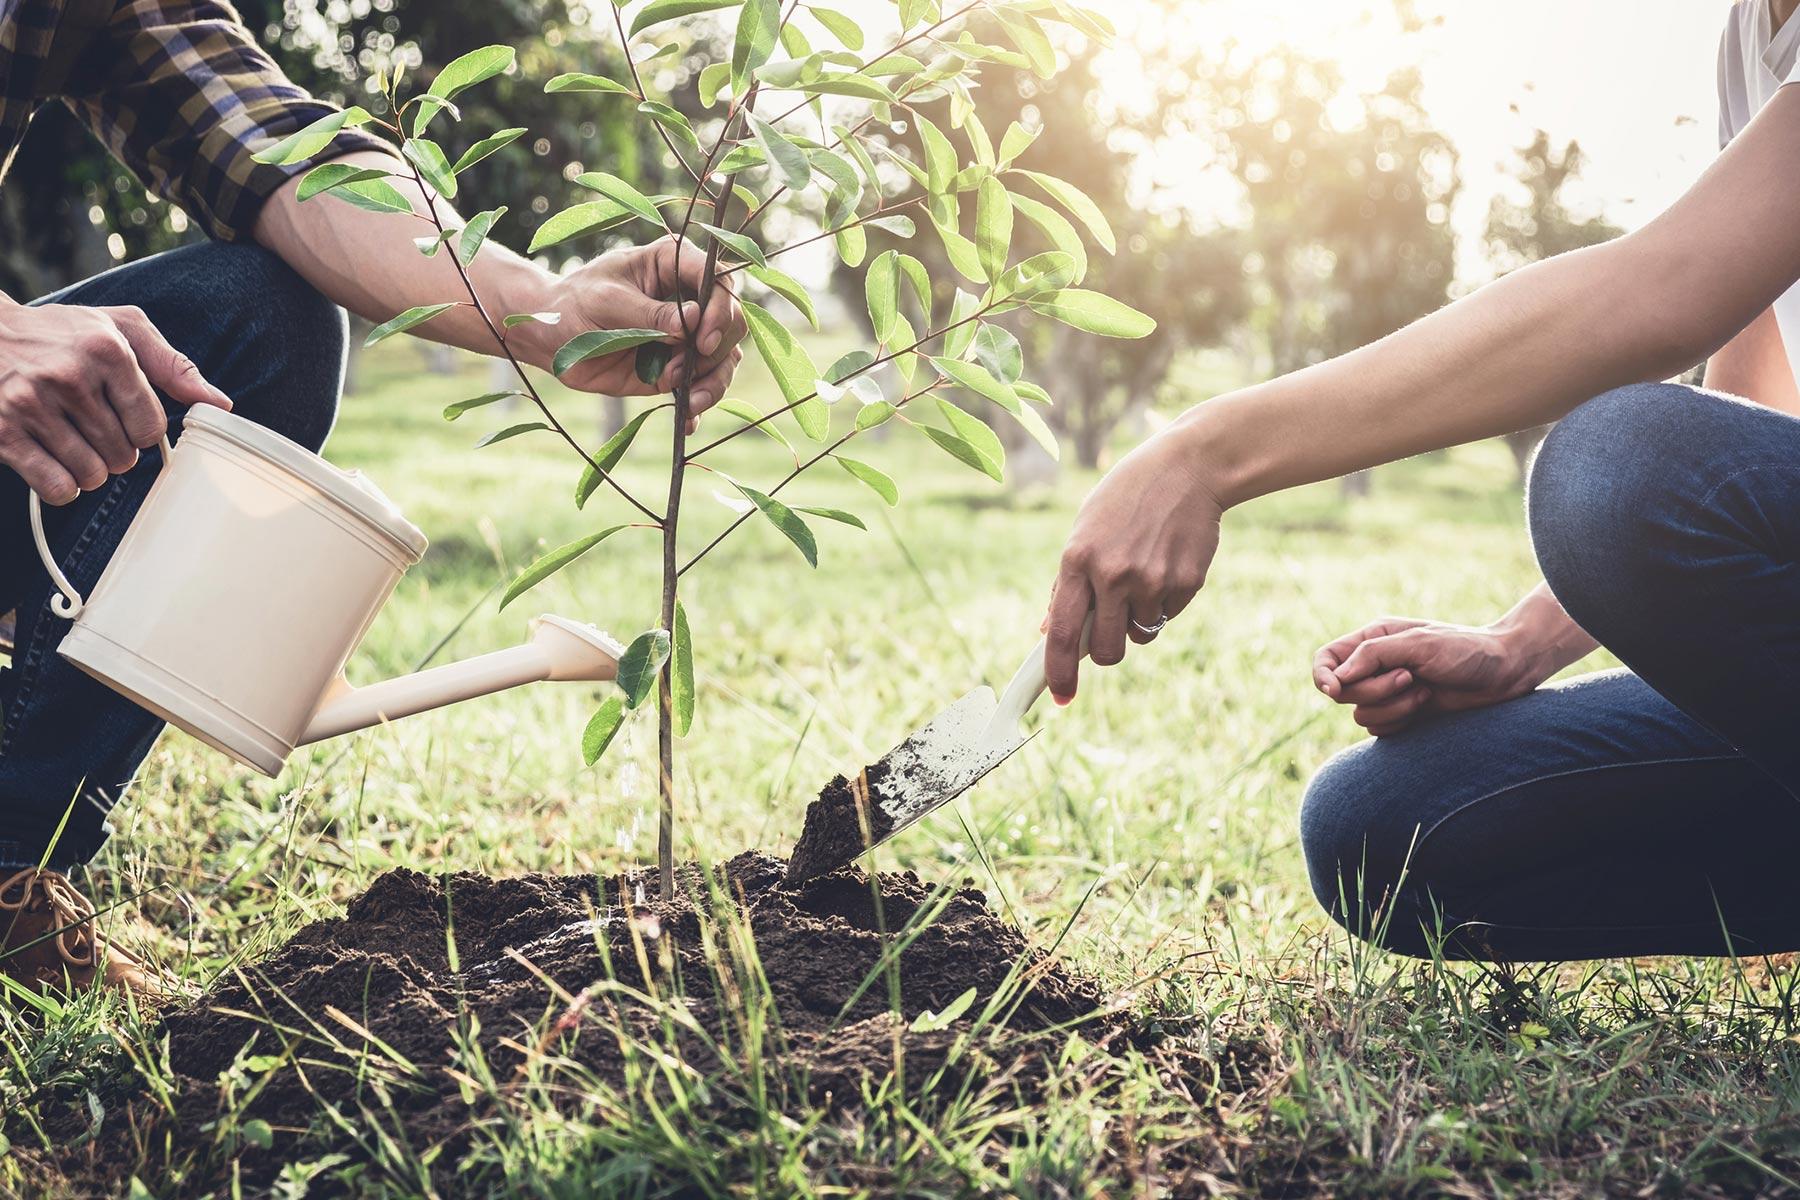 plant planting a tree hand